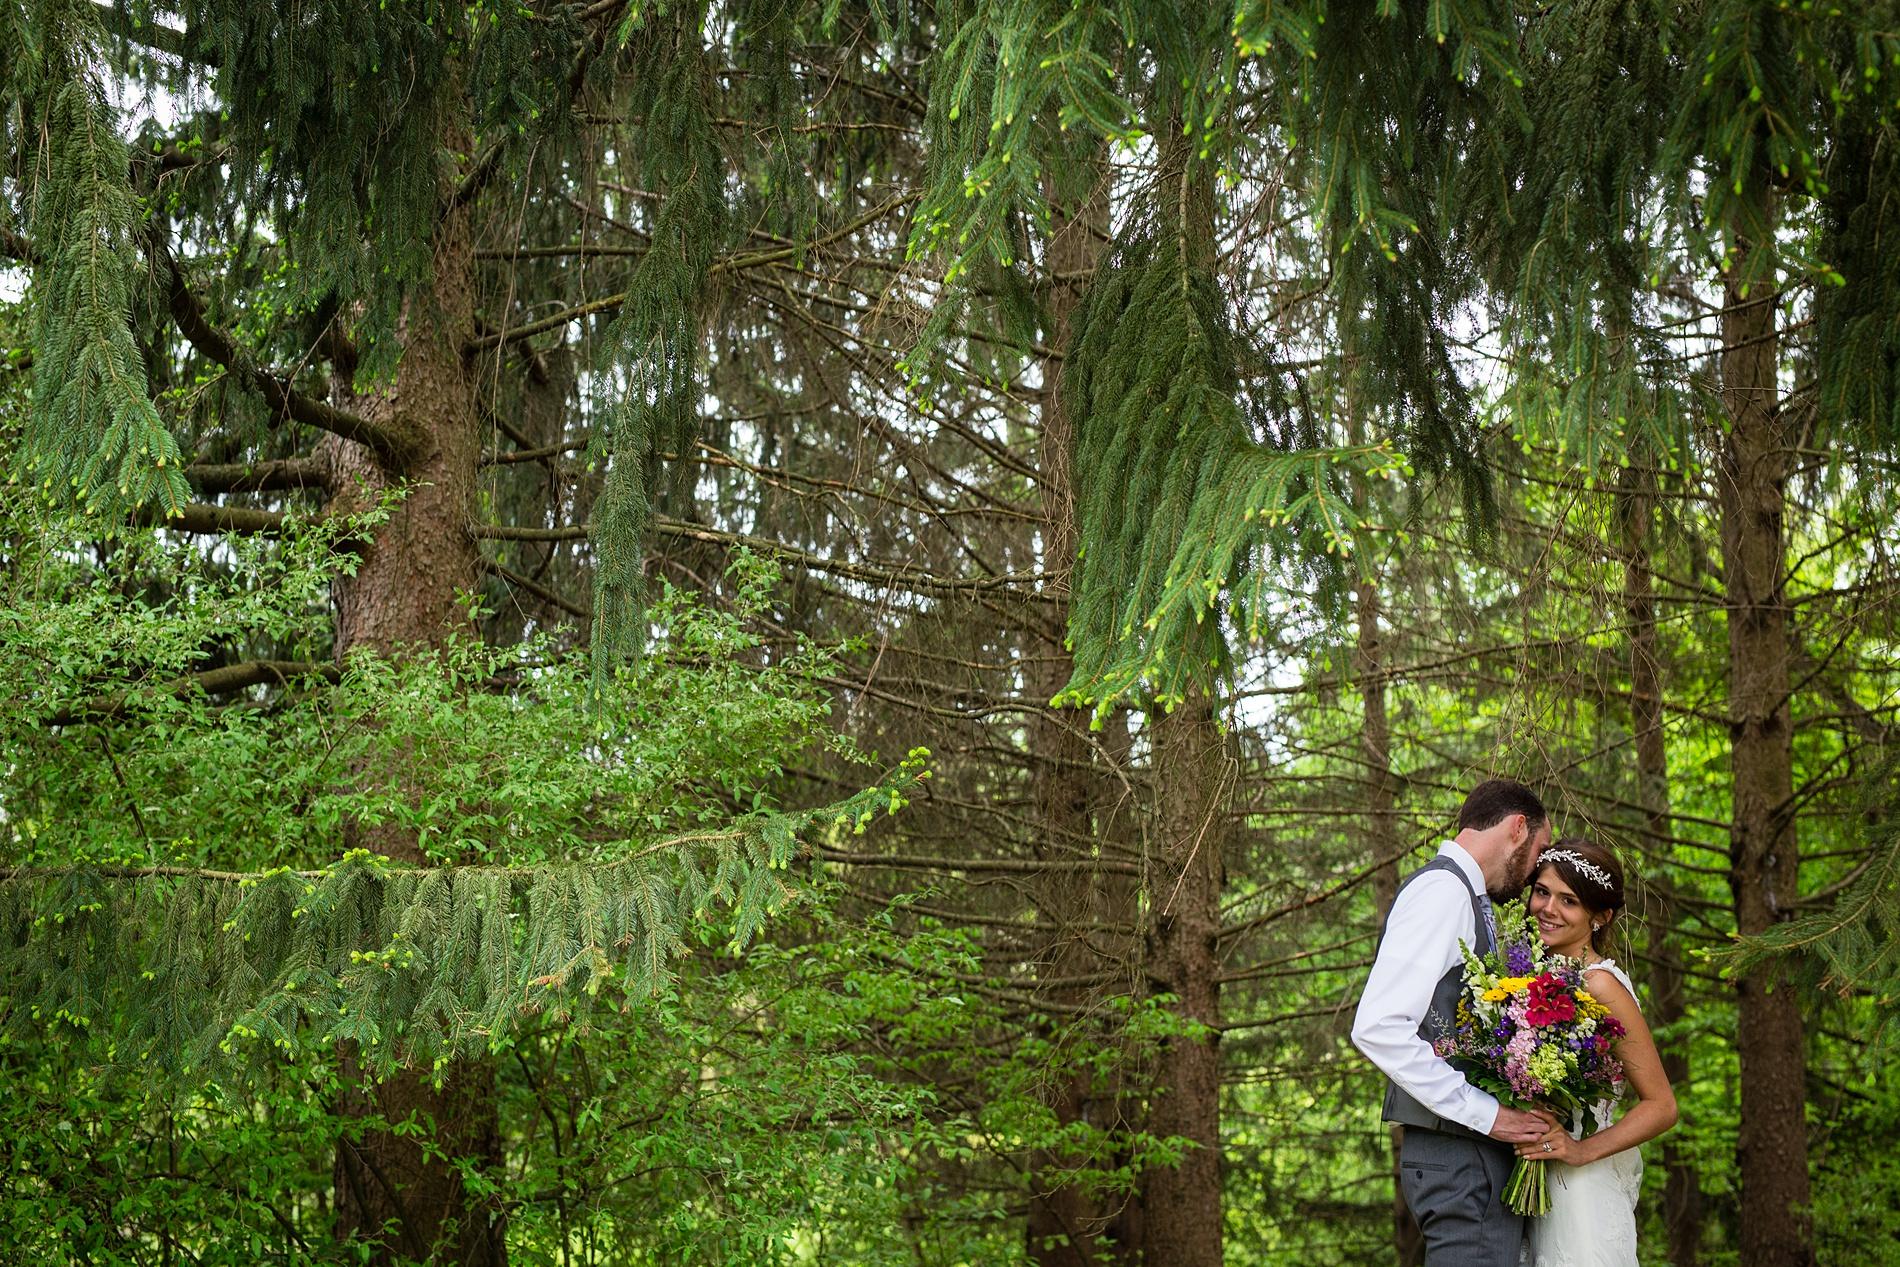 Brandon_Shafer_Photography_Brett_Autumn_Wedding_0048.jpg